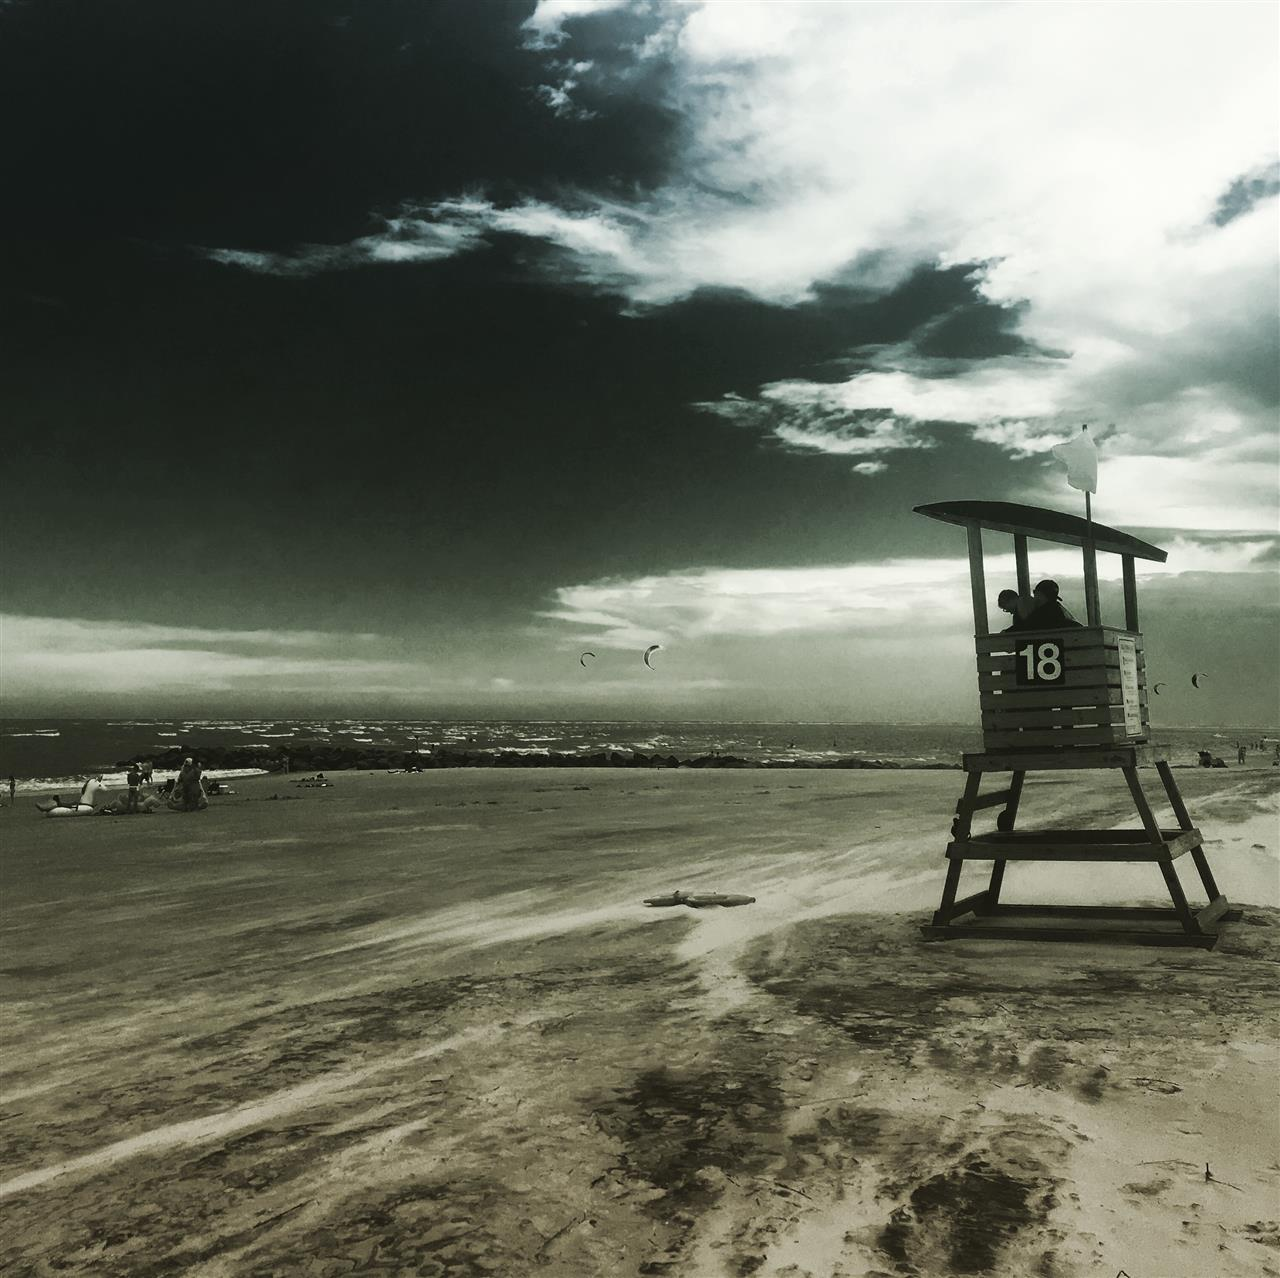 Lifeguard tower on Tybee Island